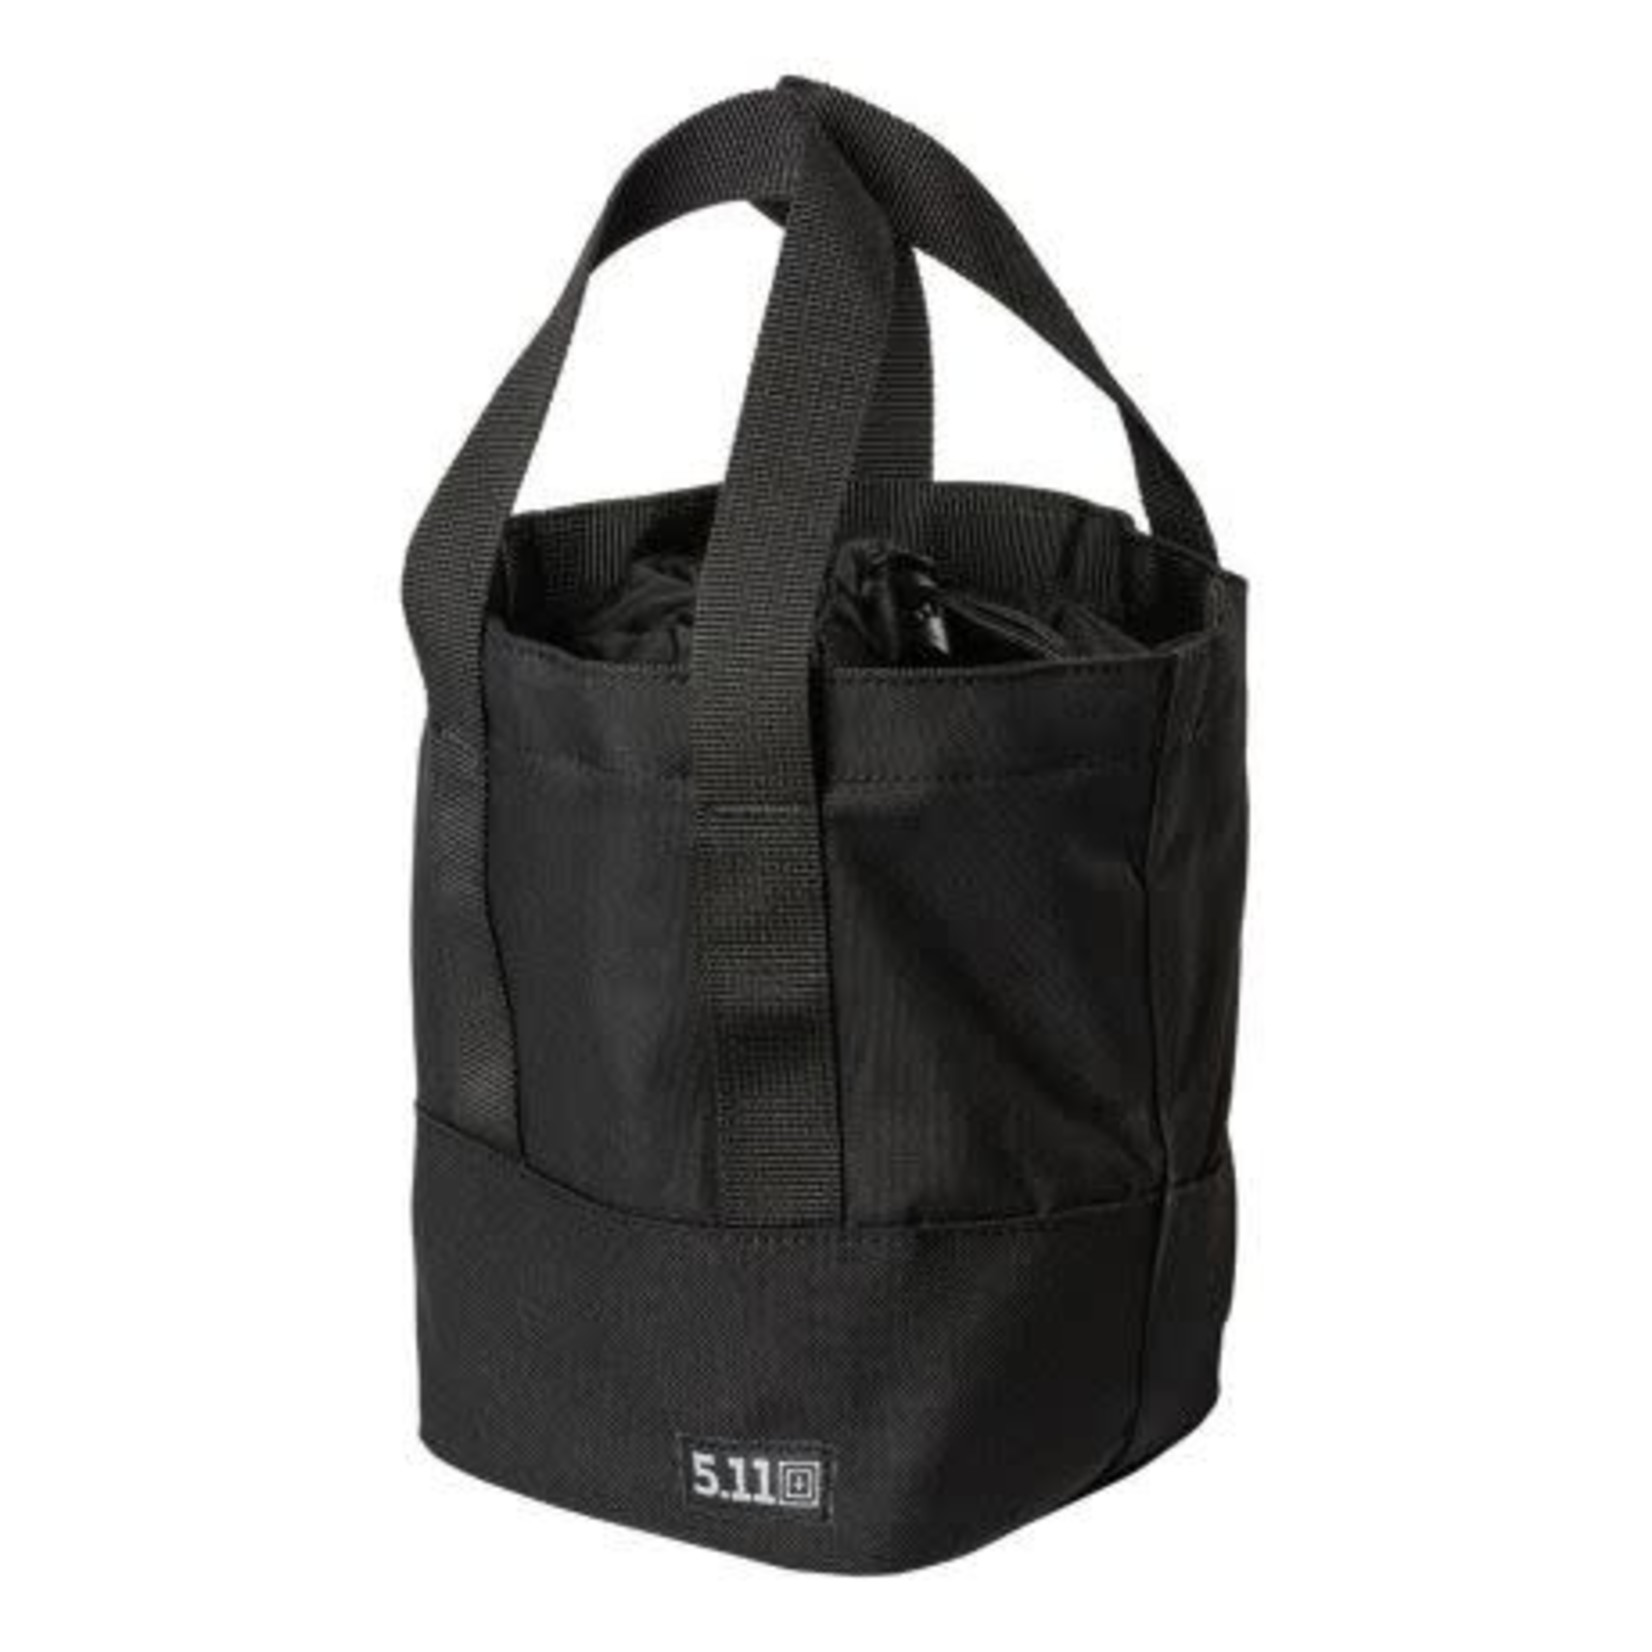 5.11 Tactical 5.11 Range Master Bucket Bag